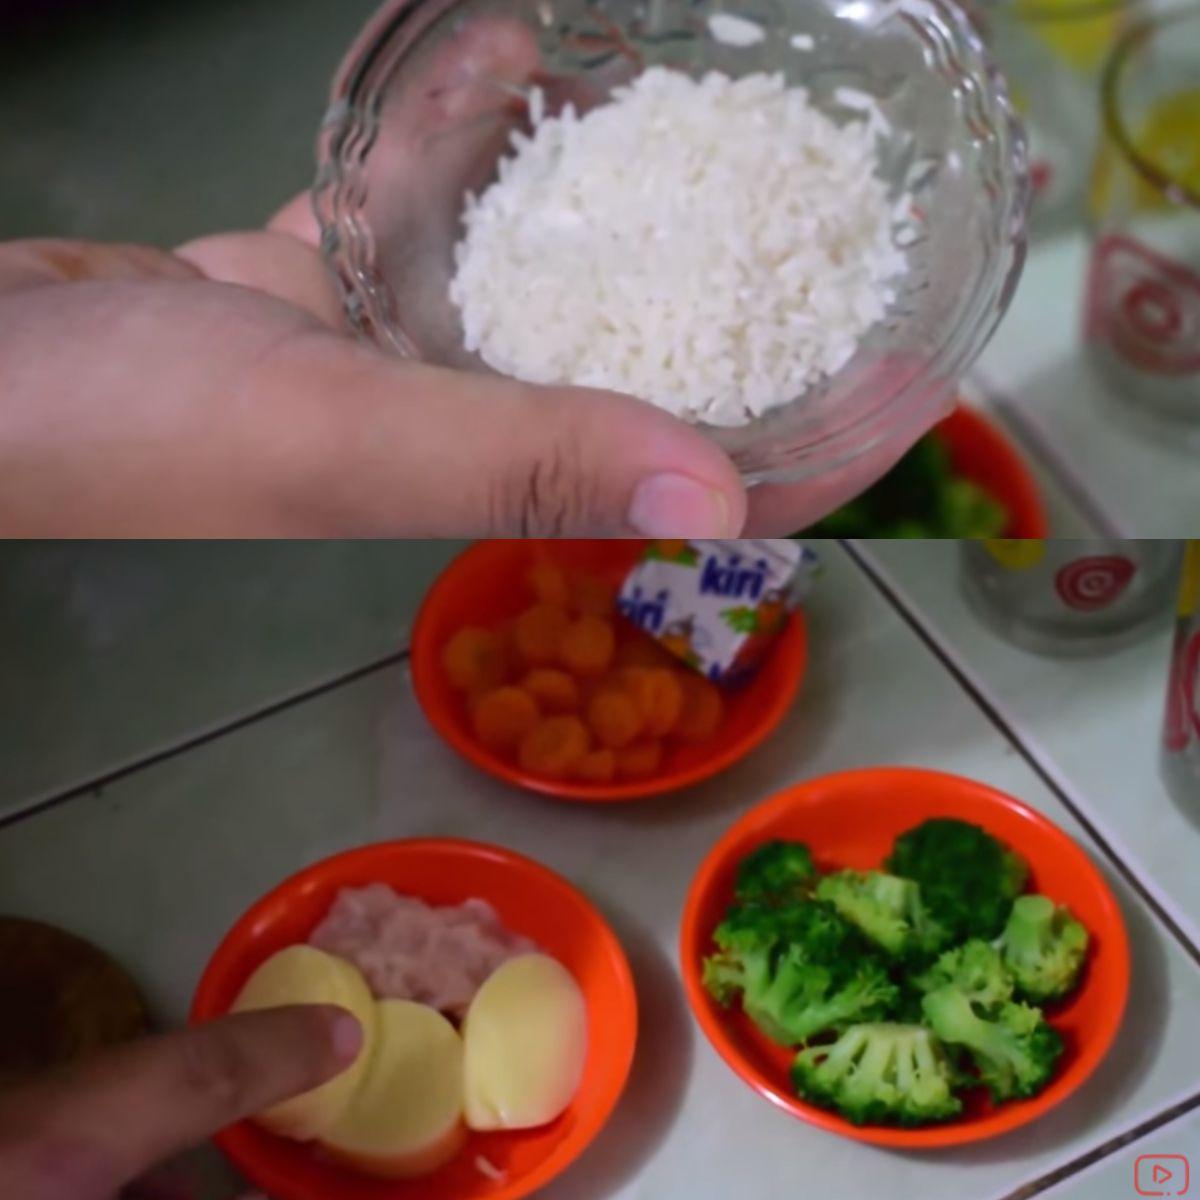 Resep Mpasi 4 Bintang Cara Mudah Buat Bubur Ayam Rumahan Untuk Si Kecil Semua Halaman Nakita